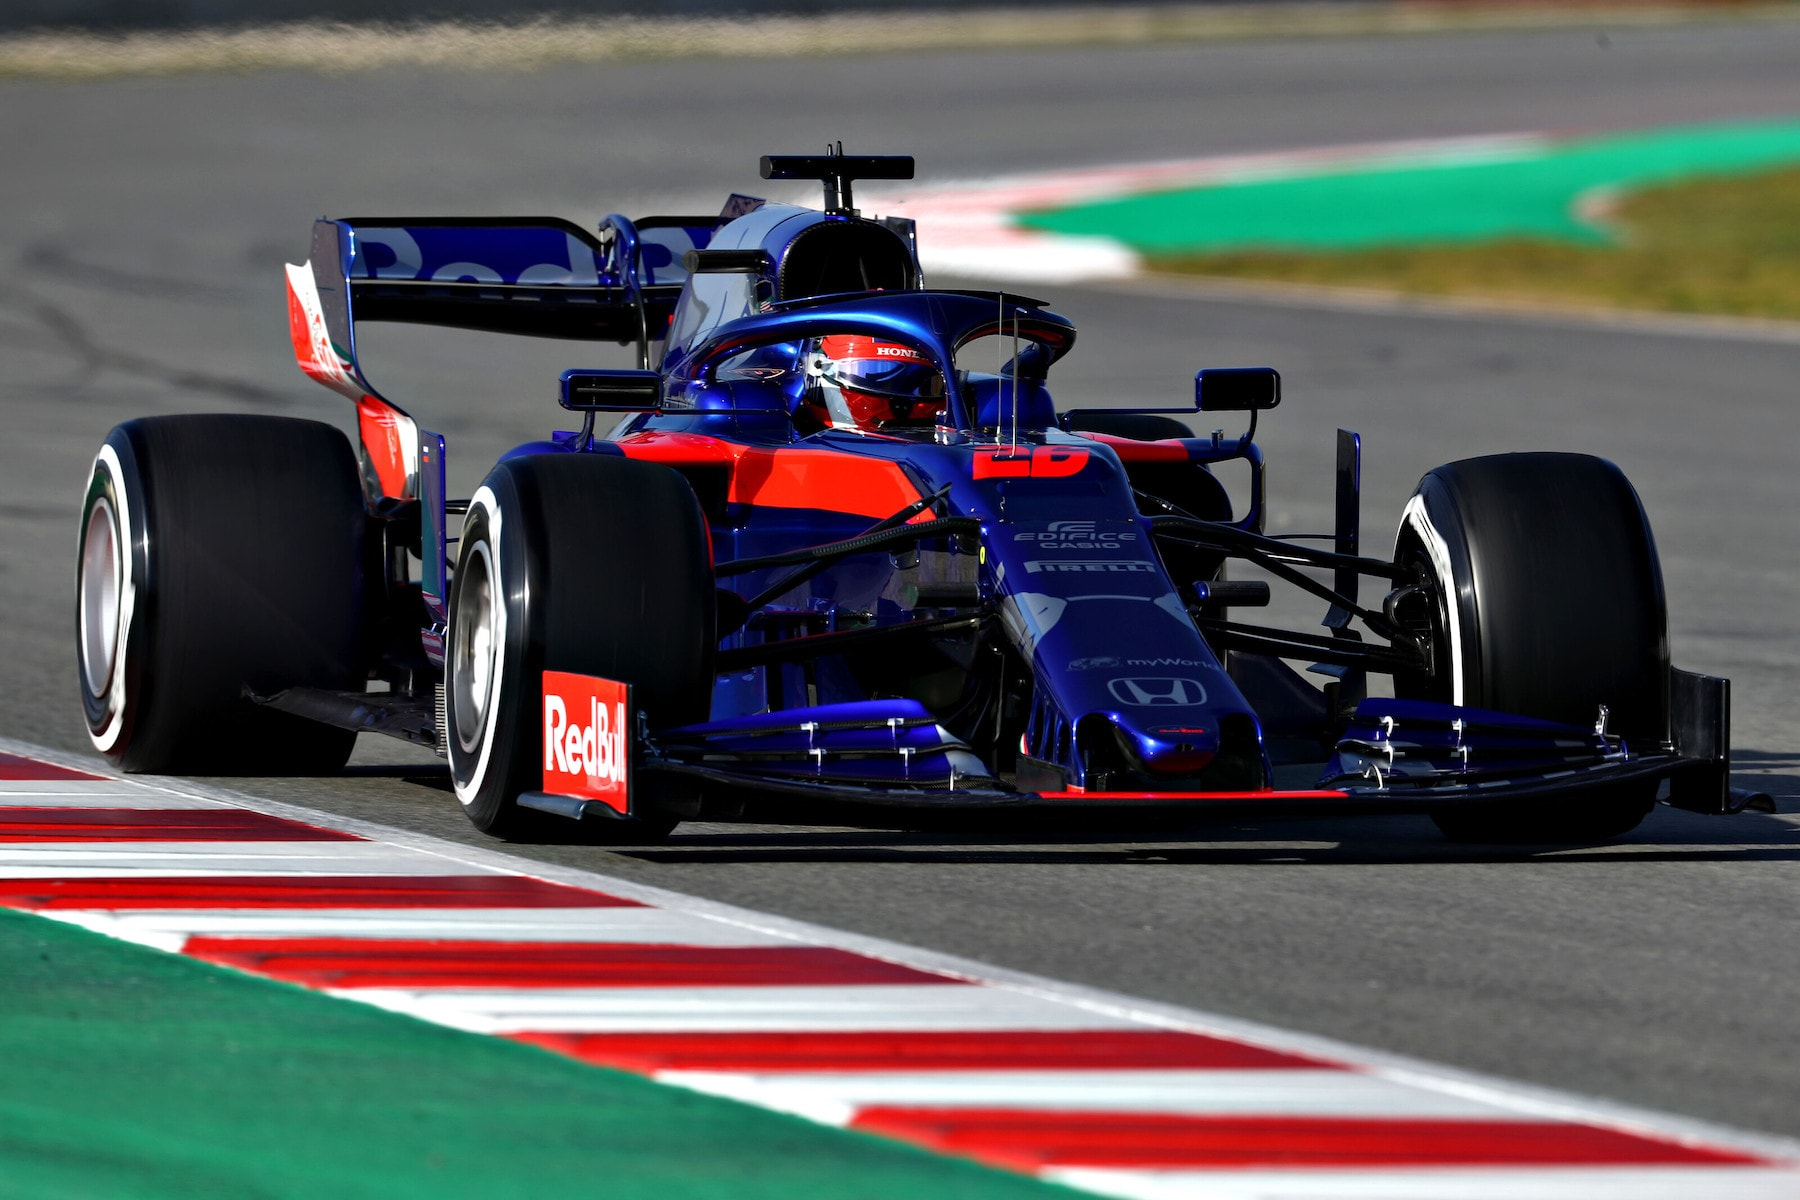 2019 Daniil Kvyat   Toro Rosso STR14   2019 Barcelona T1 D1 1 copy.jpg